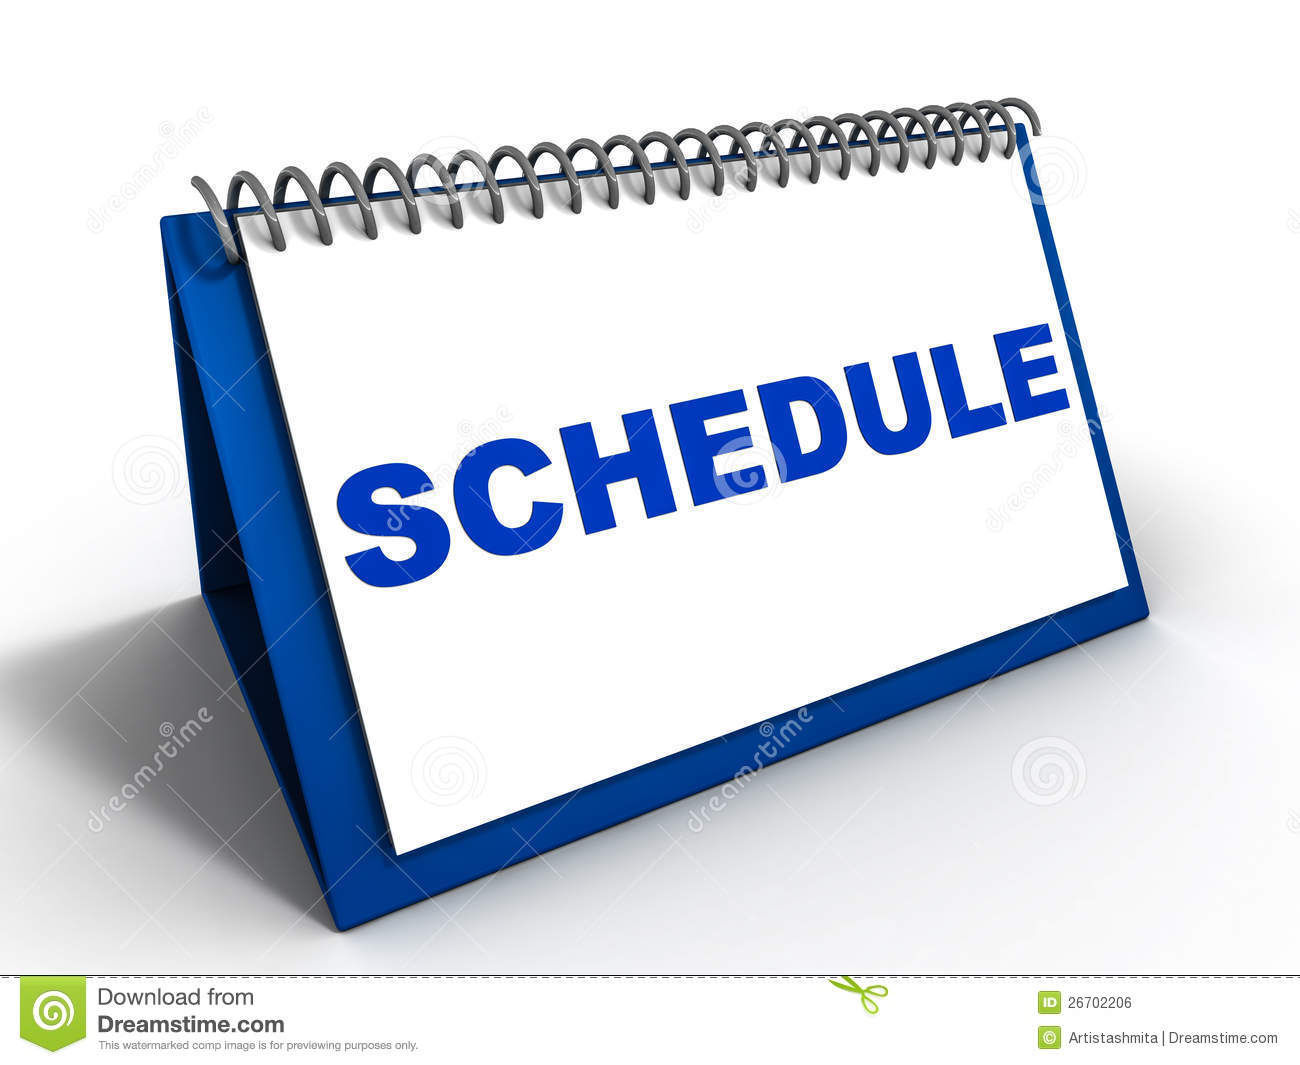 Calendar clipart scheduling. Schedule cilpart peachy ideas